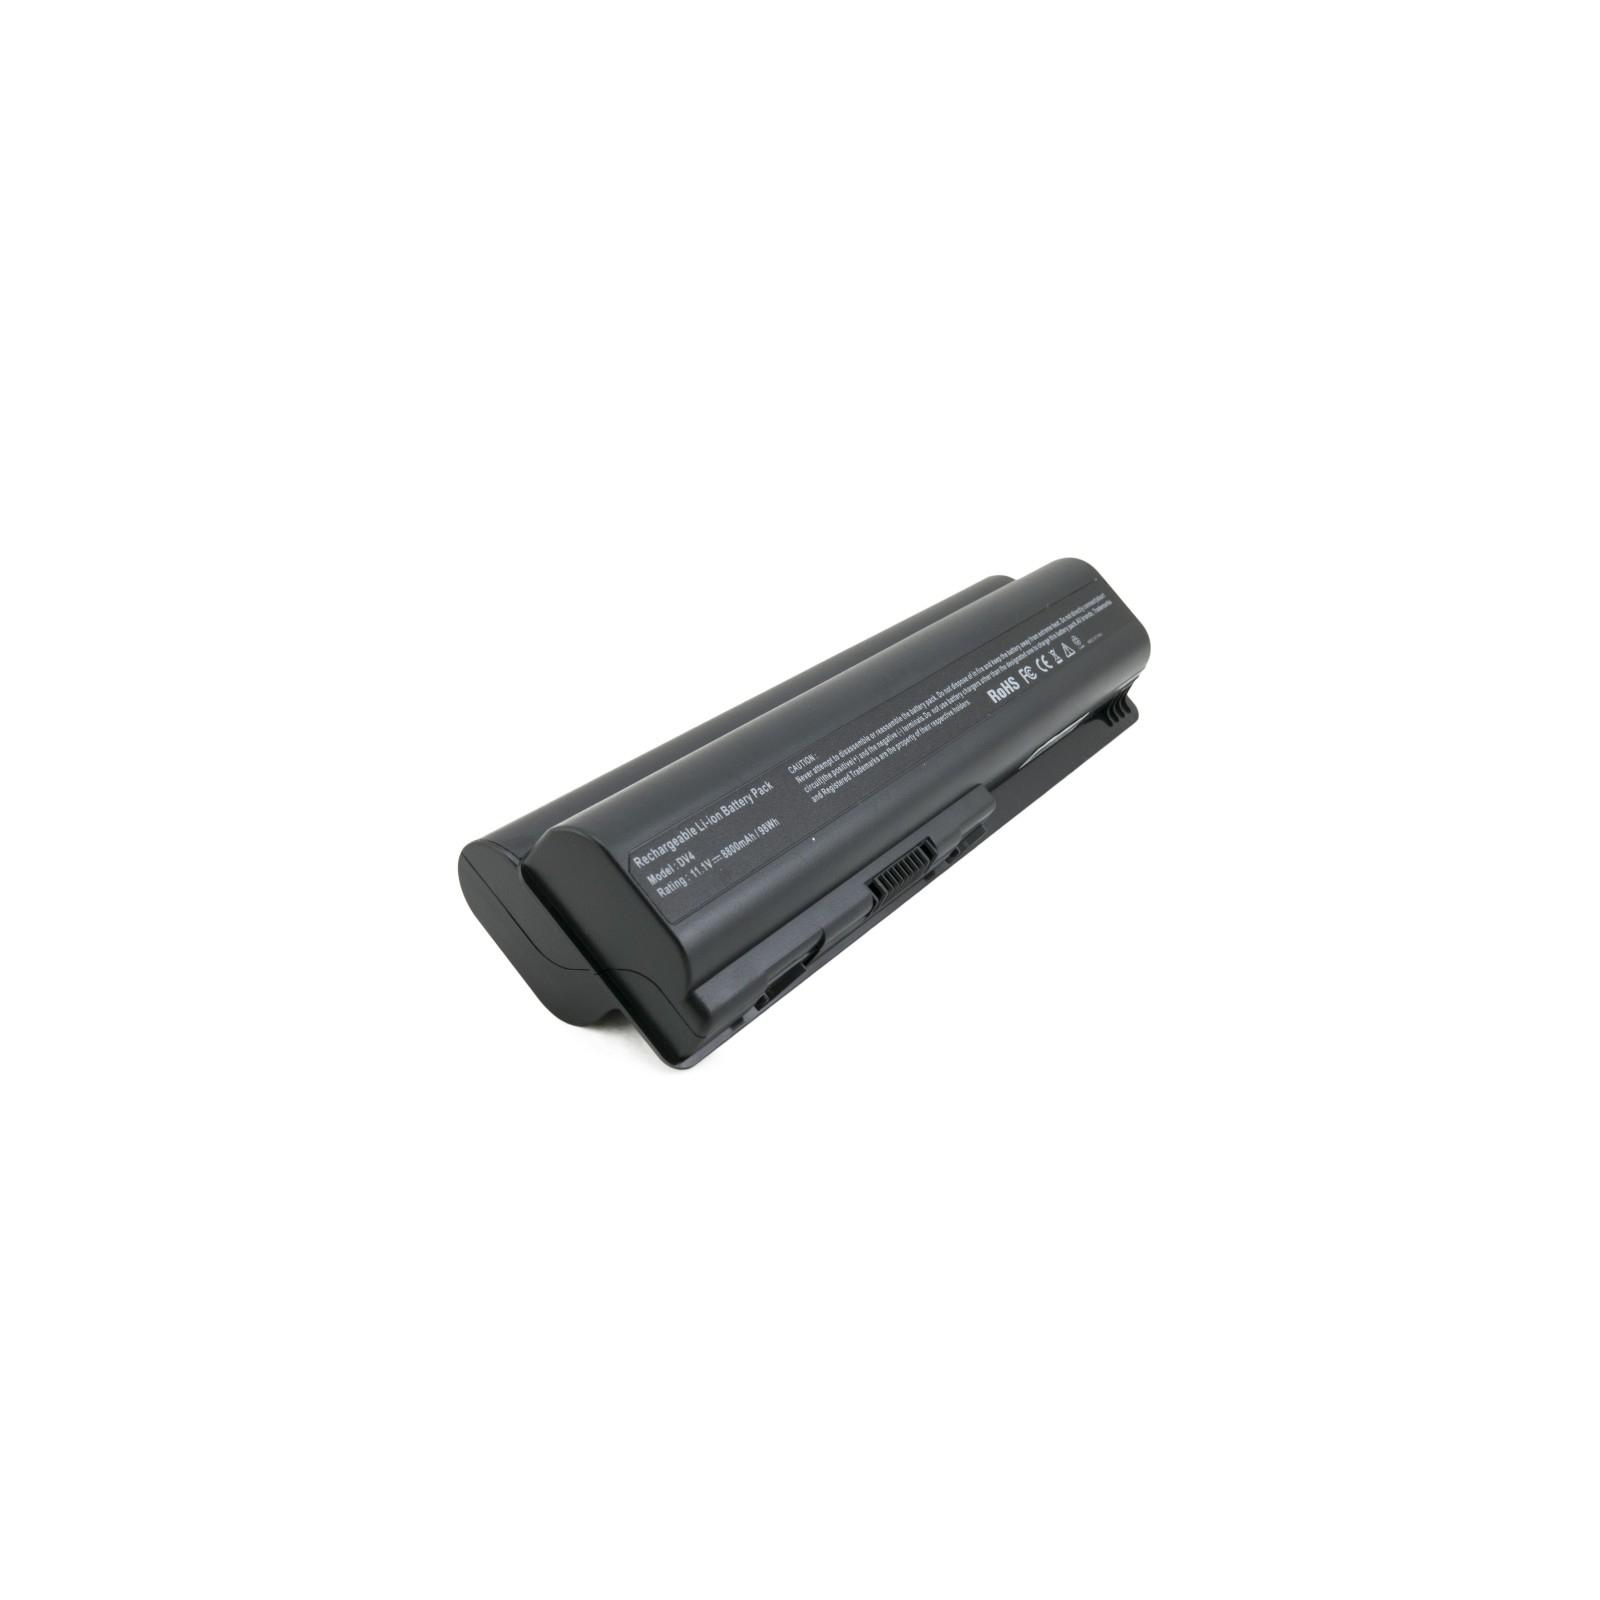 Аккумулятор для ноутбука HP Pavilion DV4 (HSTNN-DB73) 8800 mAh EXTRADIGITAL (BNH3945) изображение 2